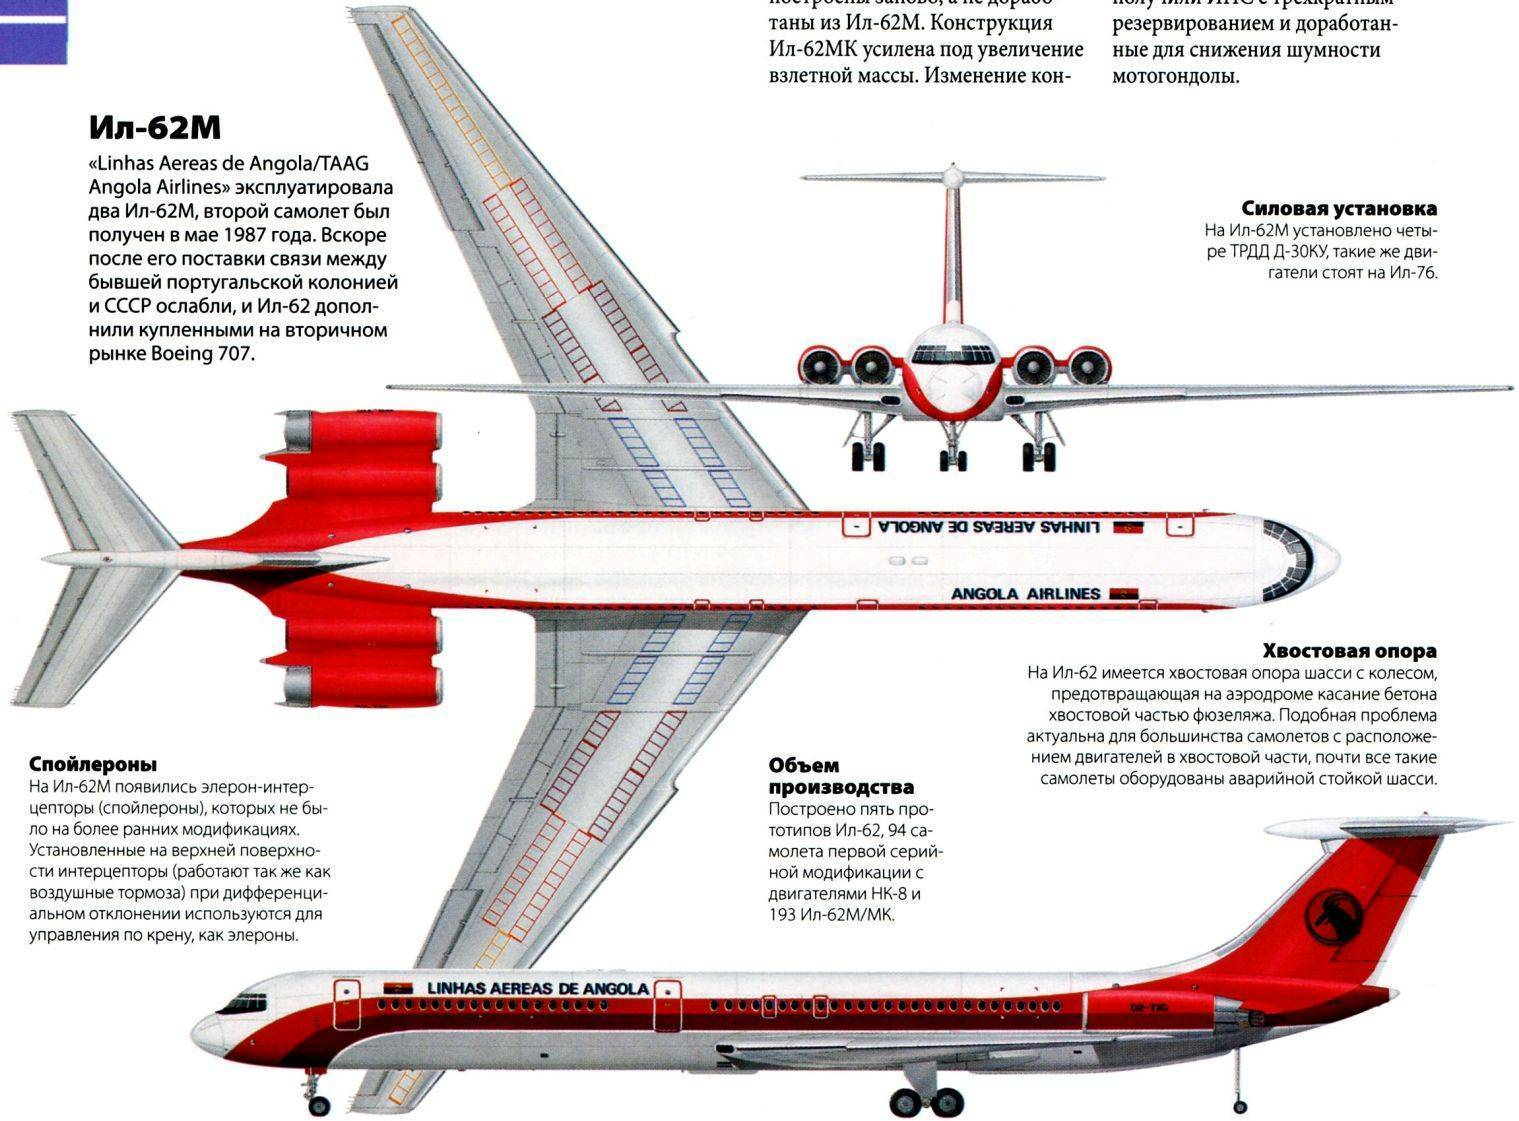 Самолет ил-62